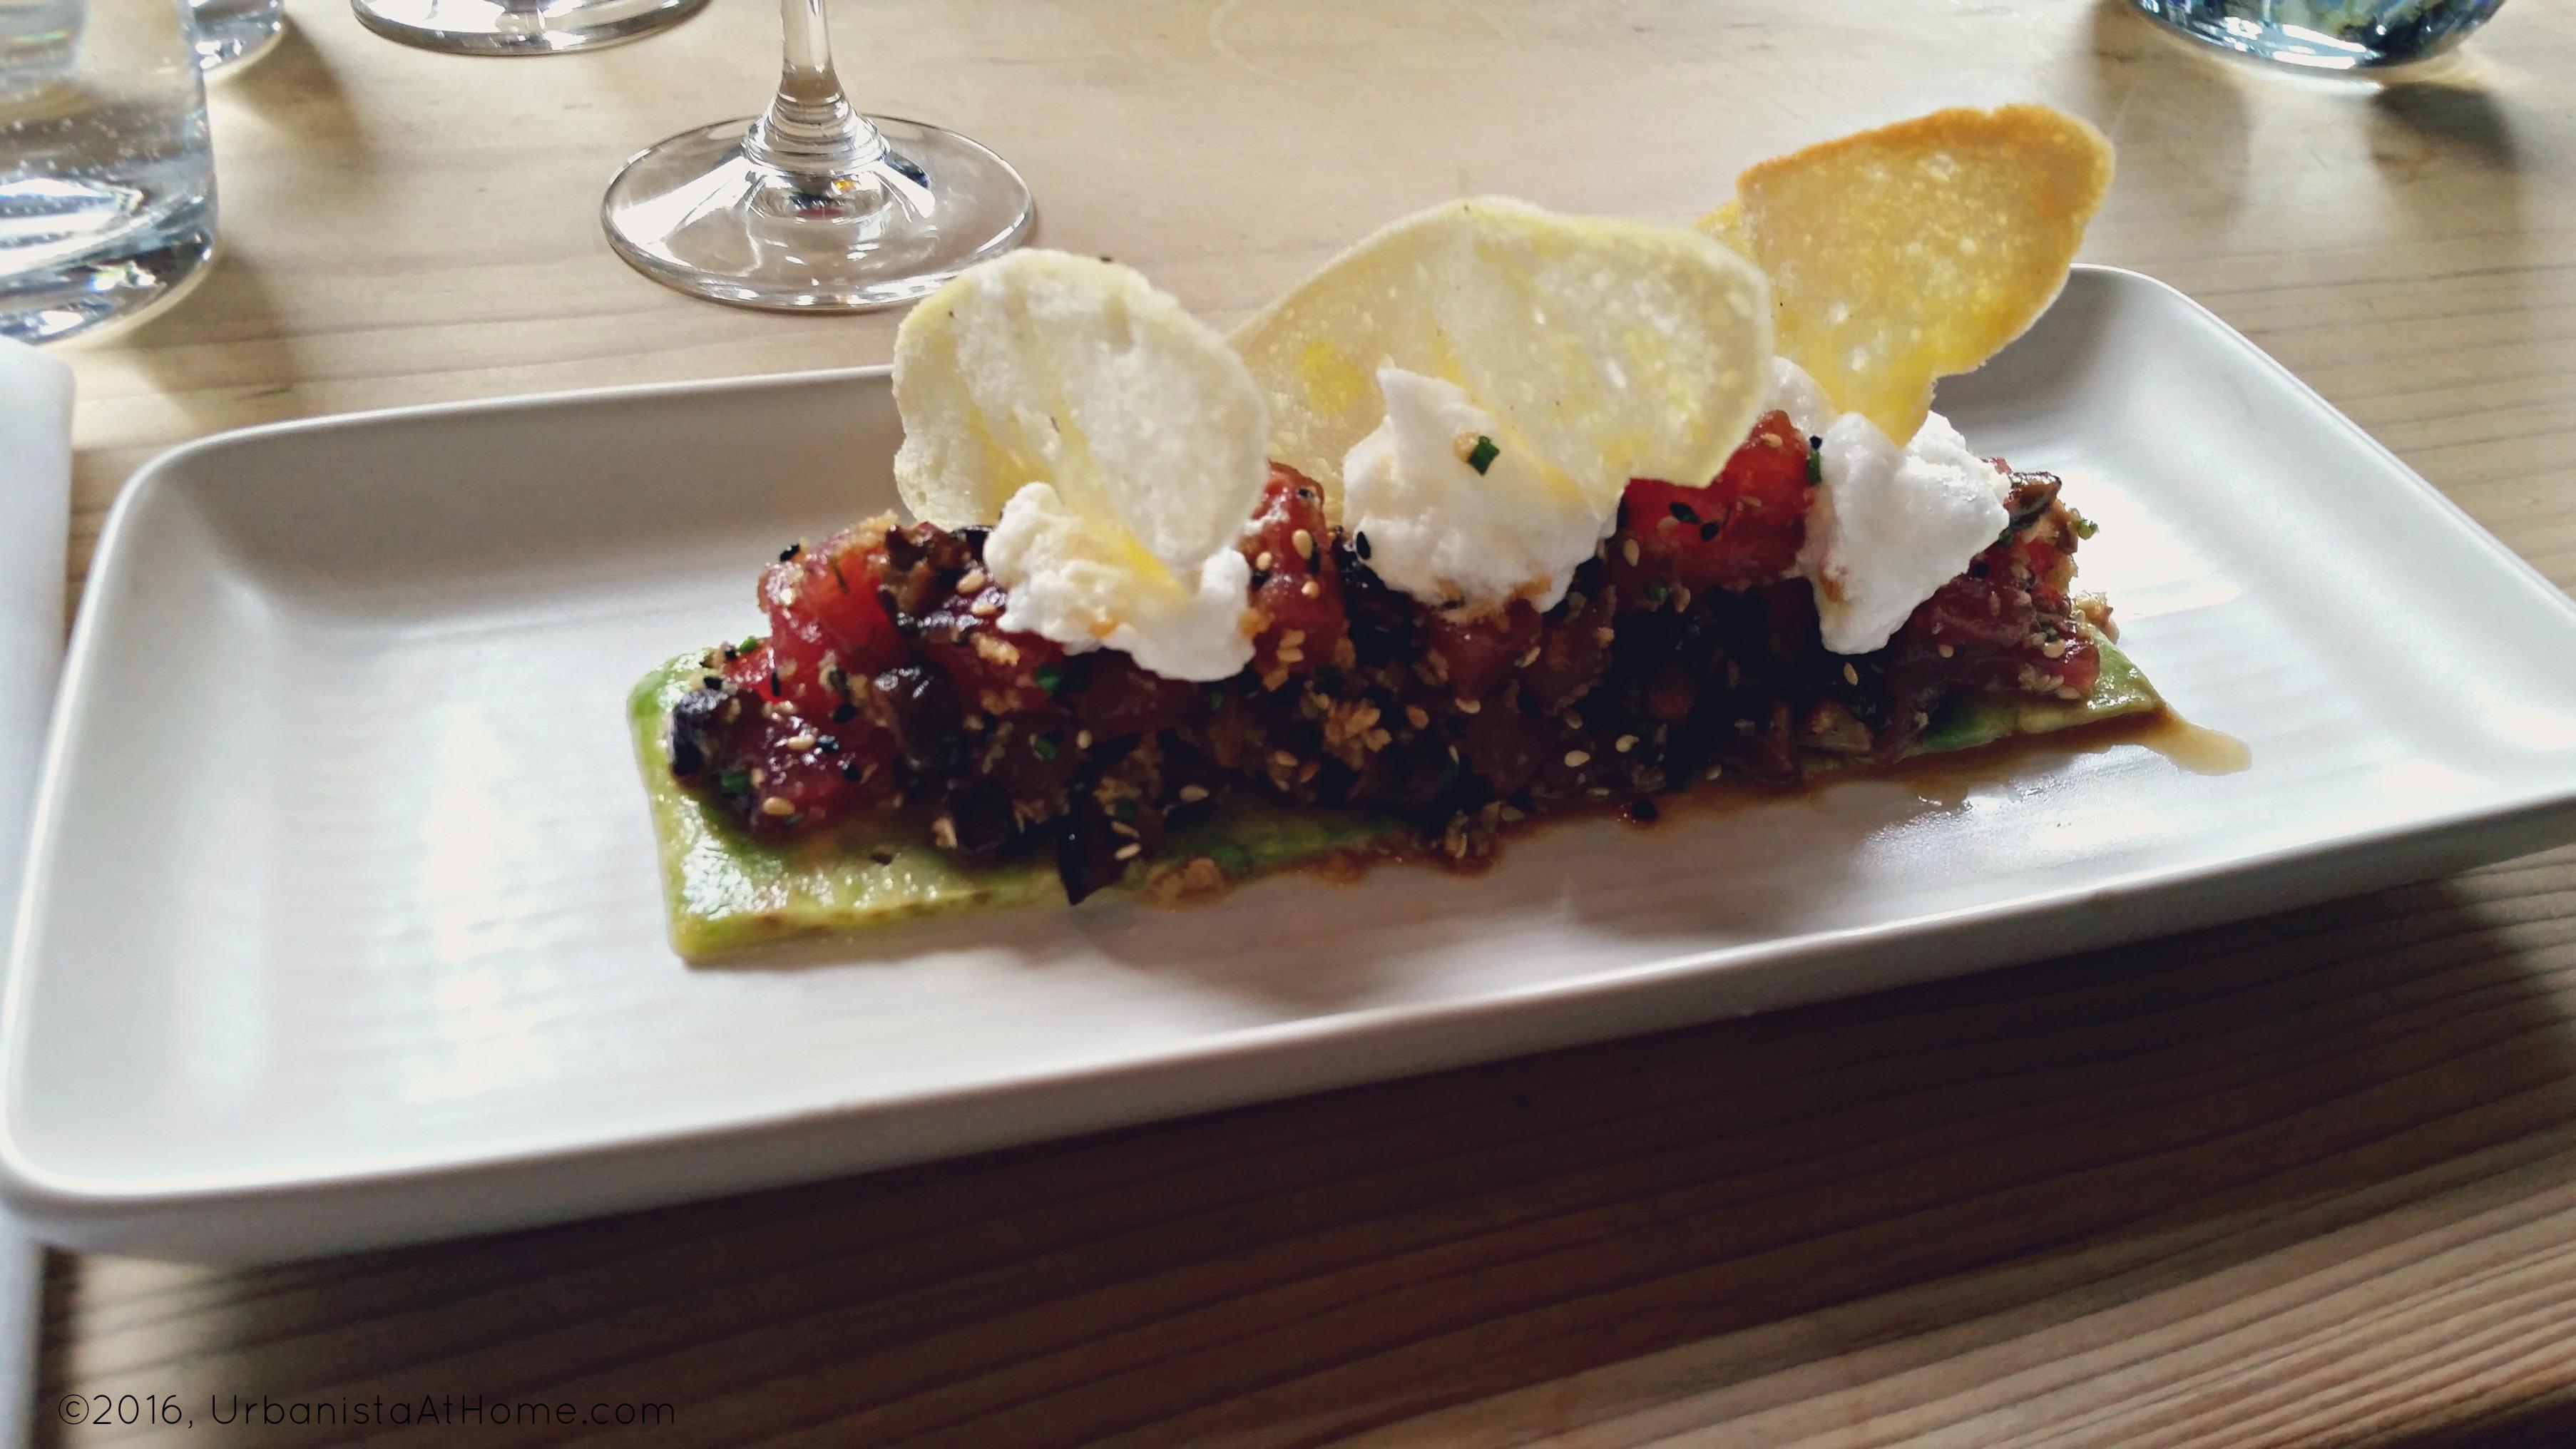 urbanistaathome-com-tuna-tataki-and-why-you-should-take-a-cooking-class